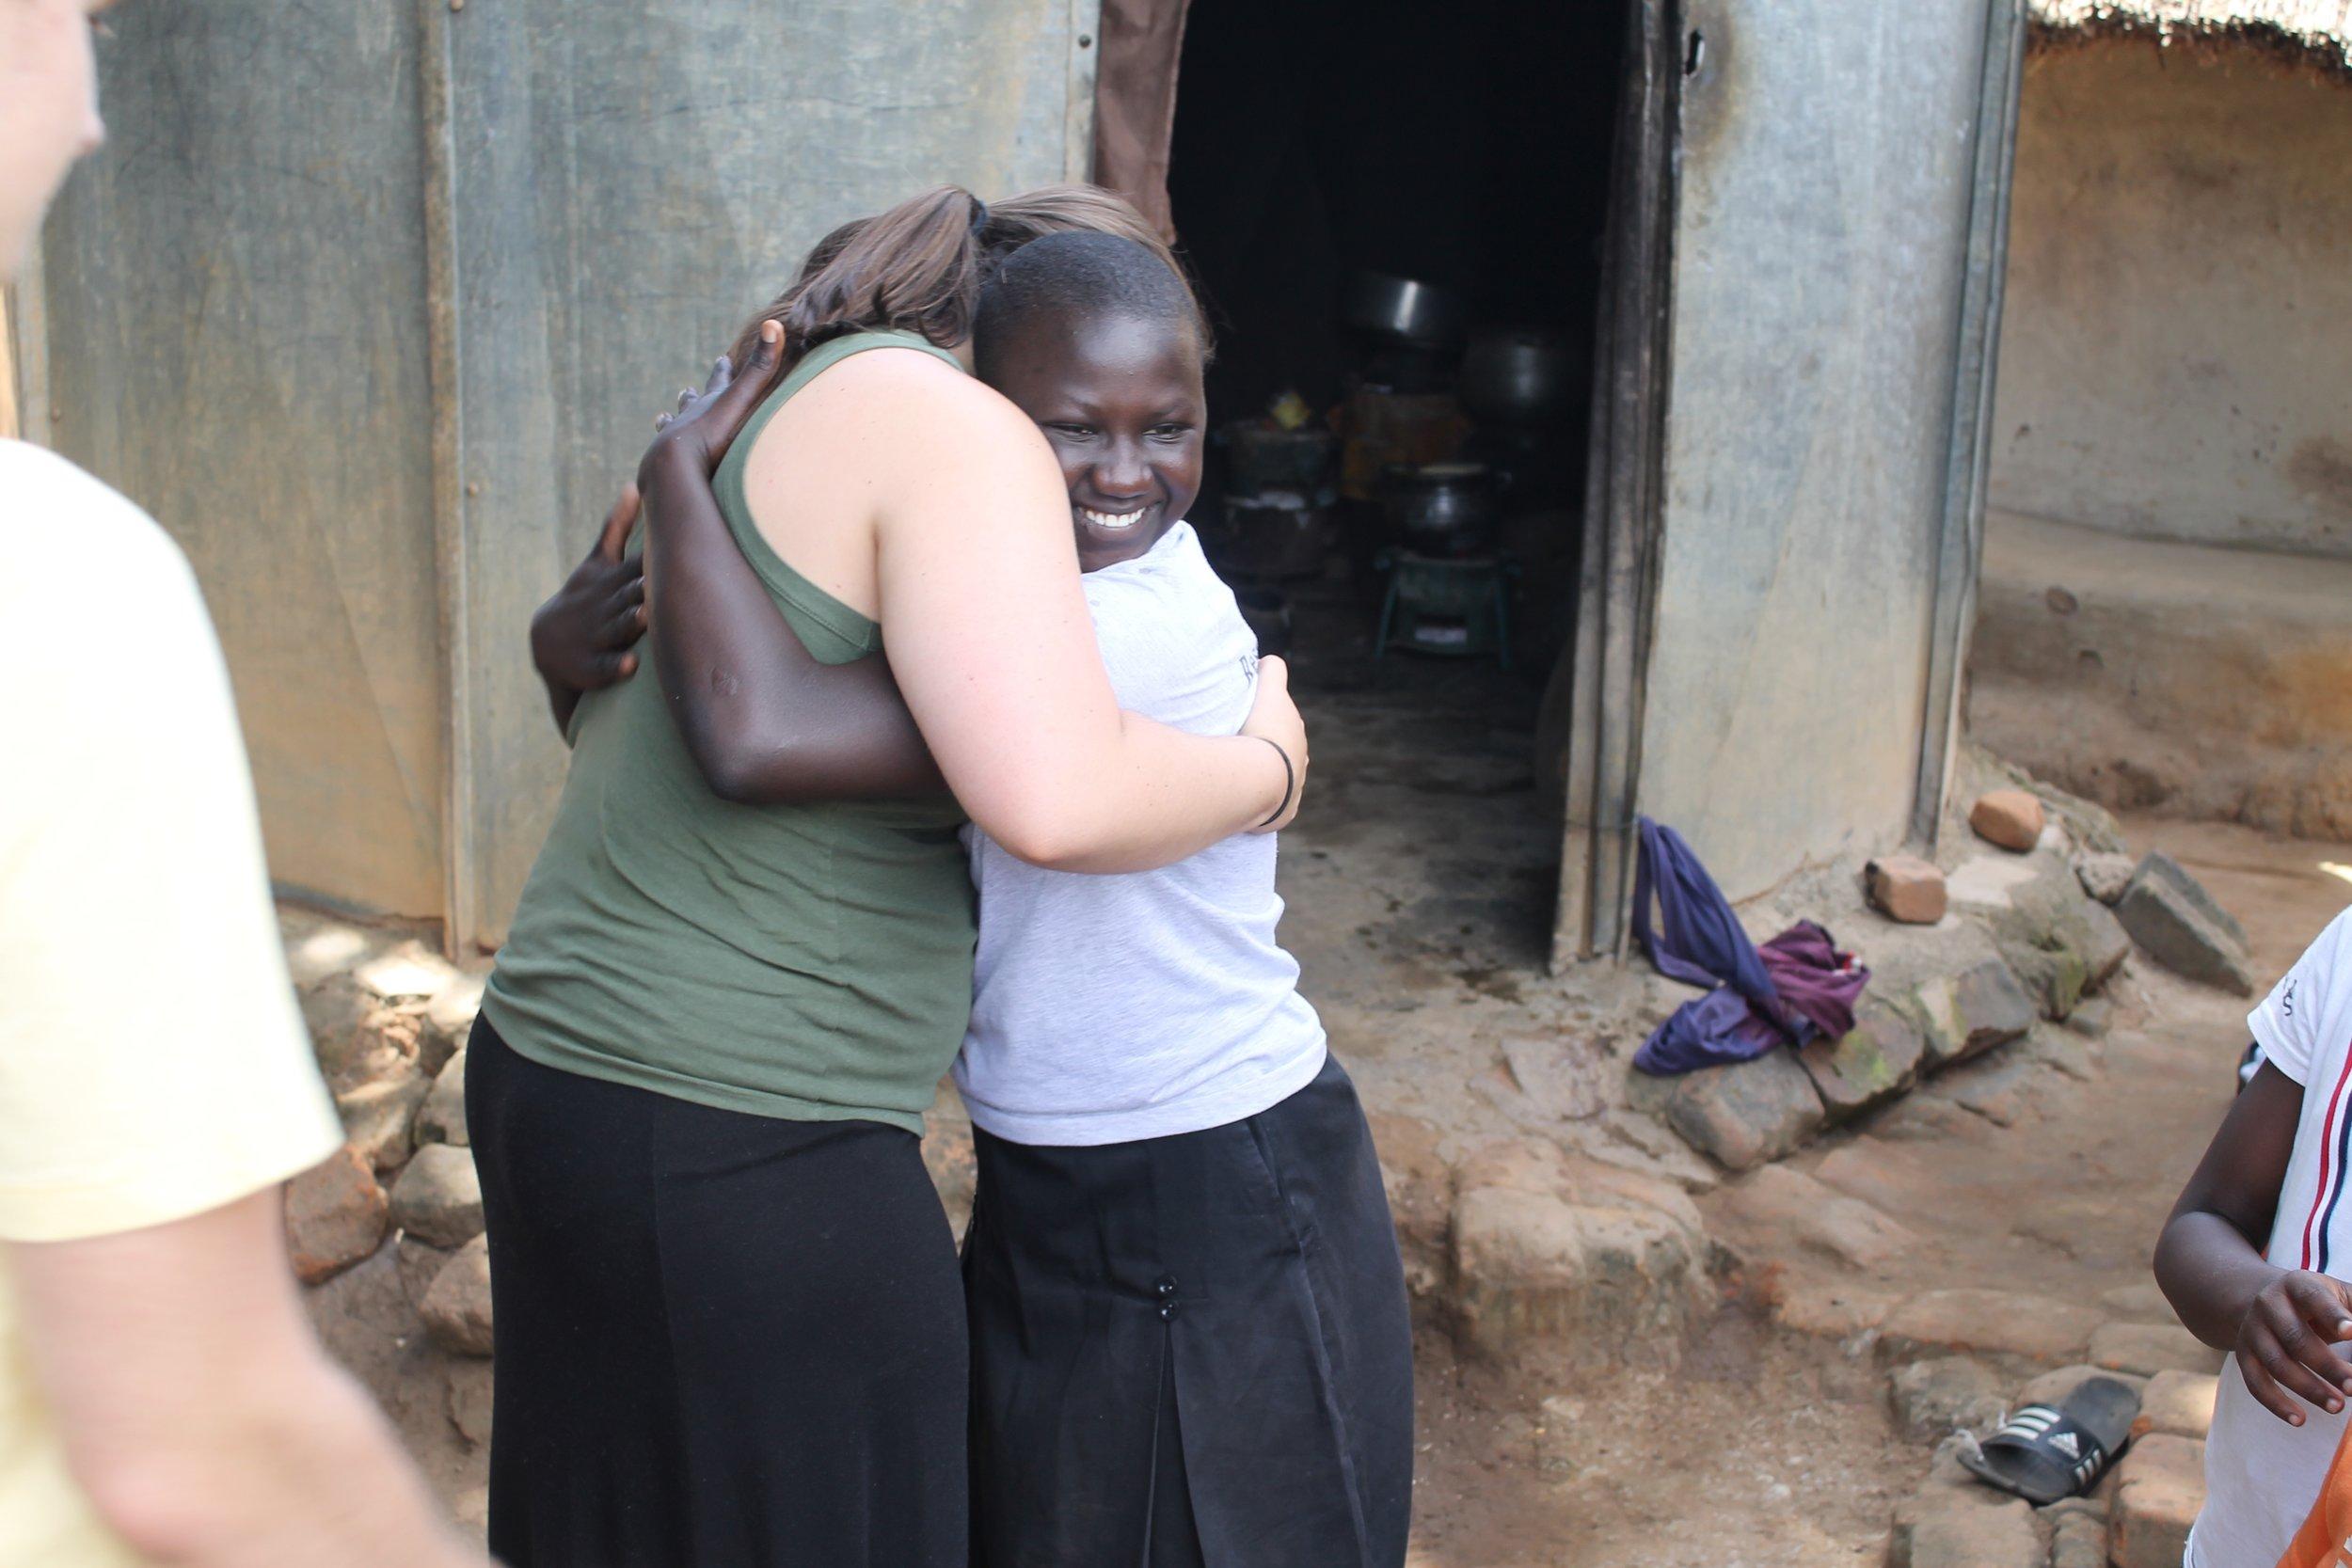 maria and laker hug.jpg